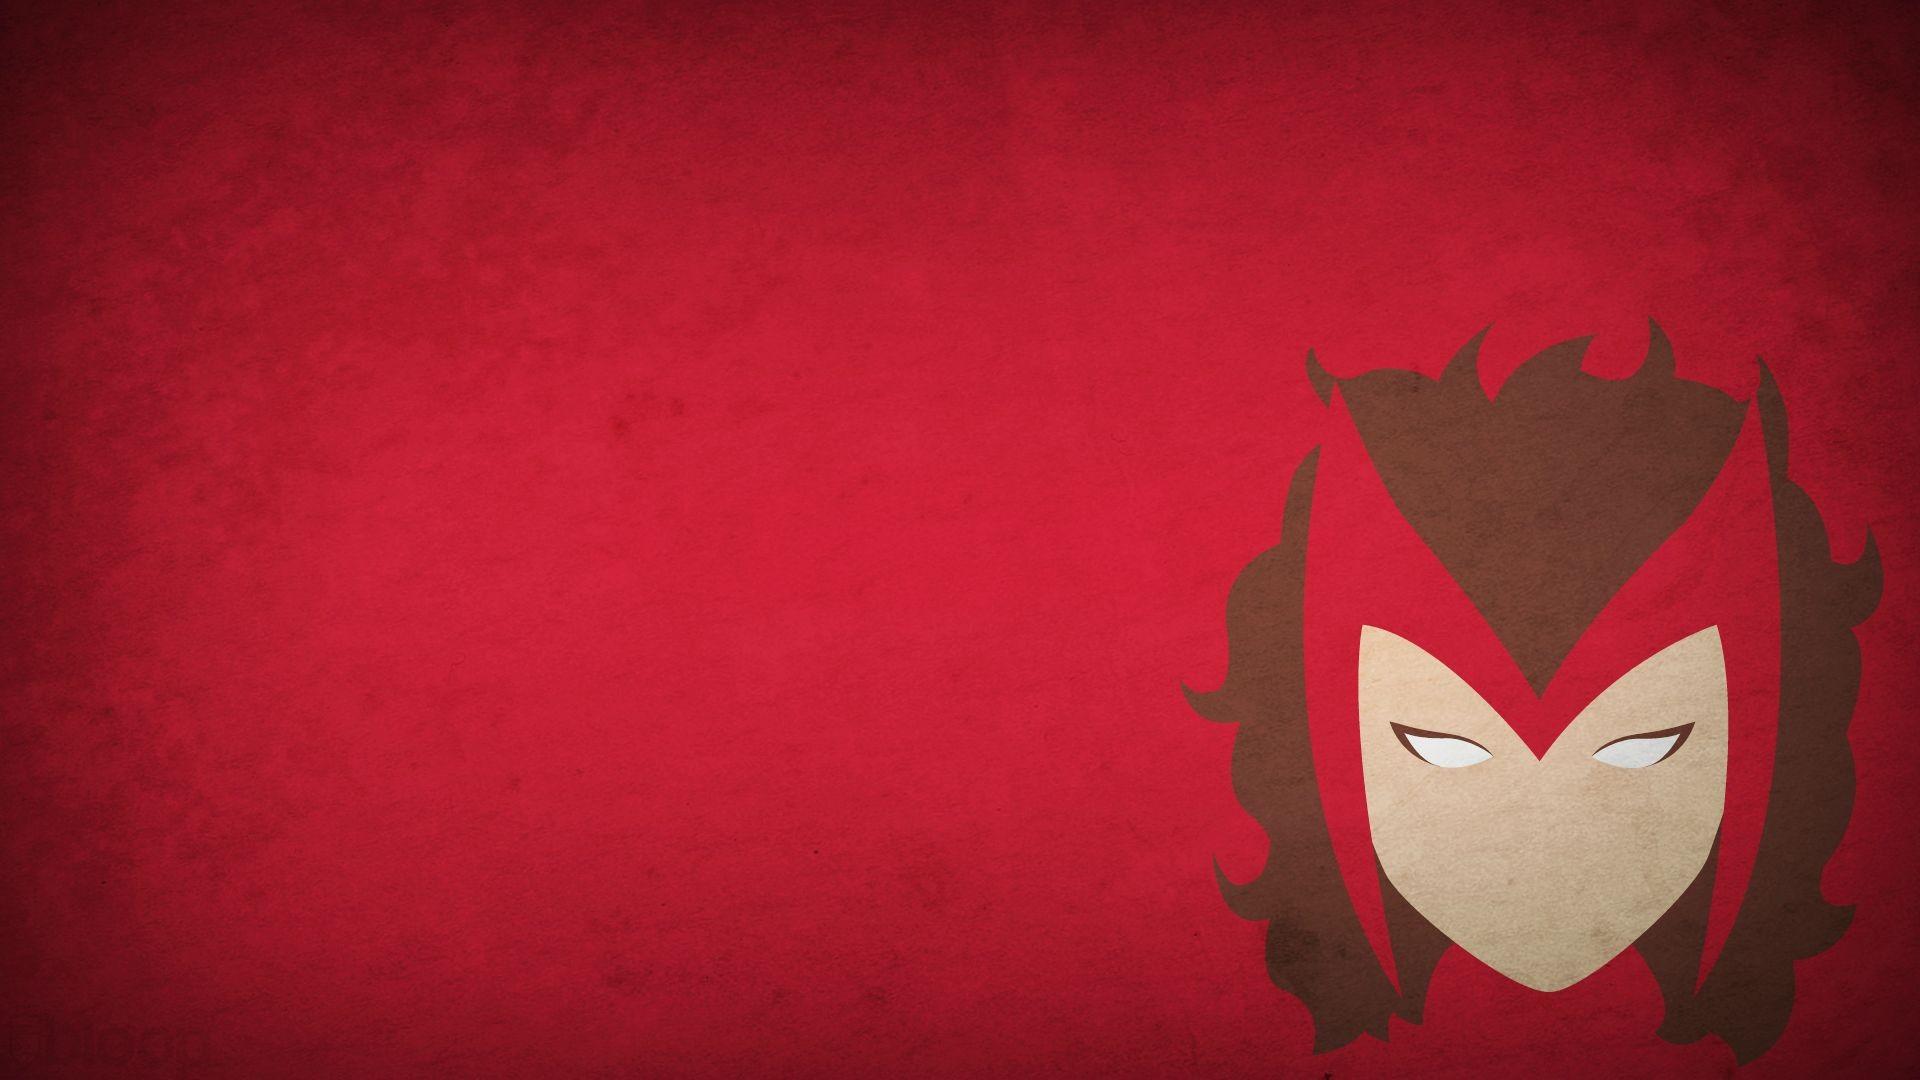 Minimalism Blo0p Scarlet Witch